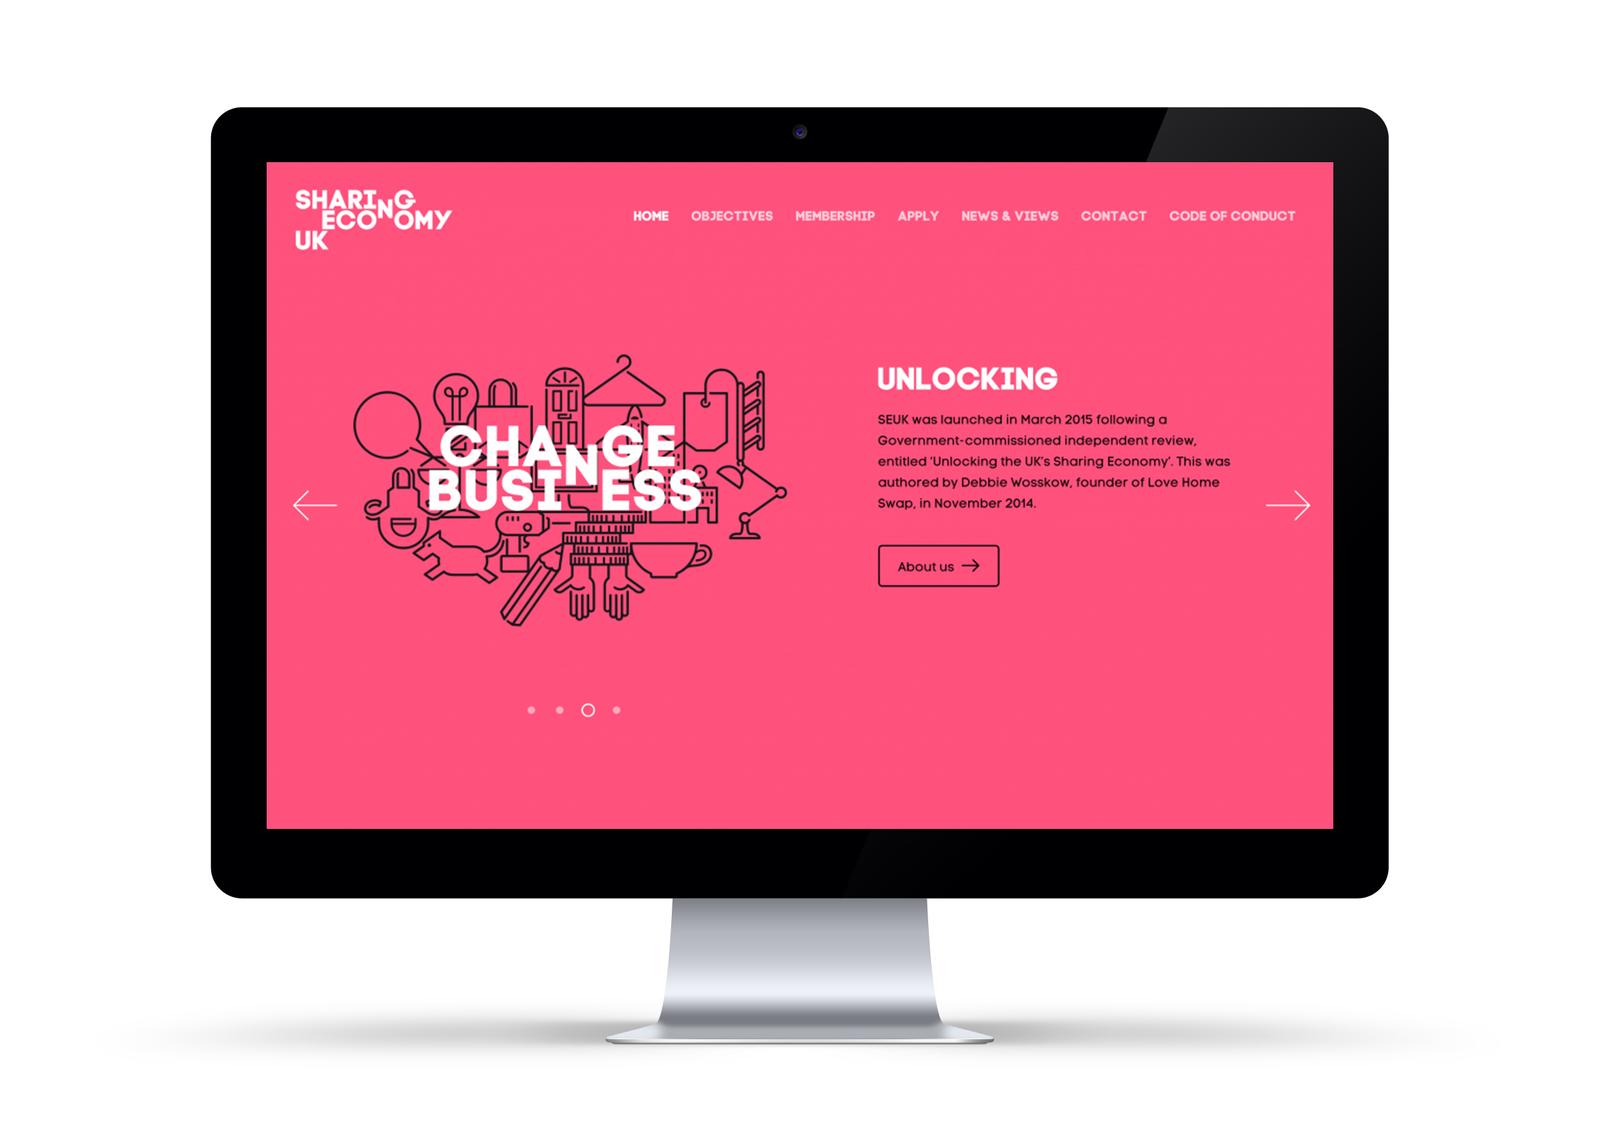 Sharing Economy Website